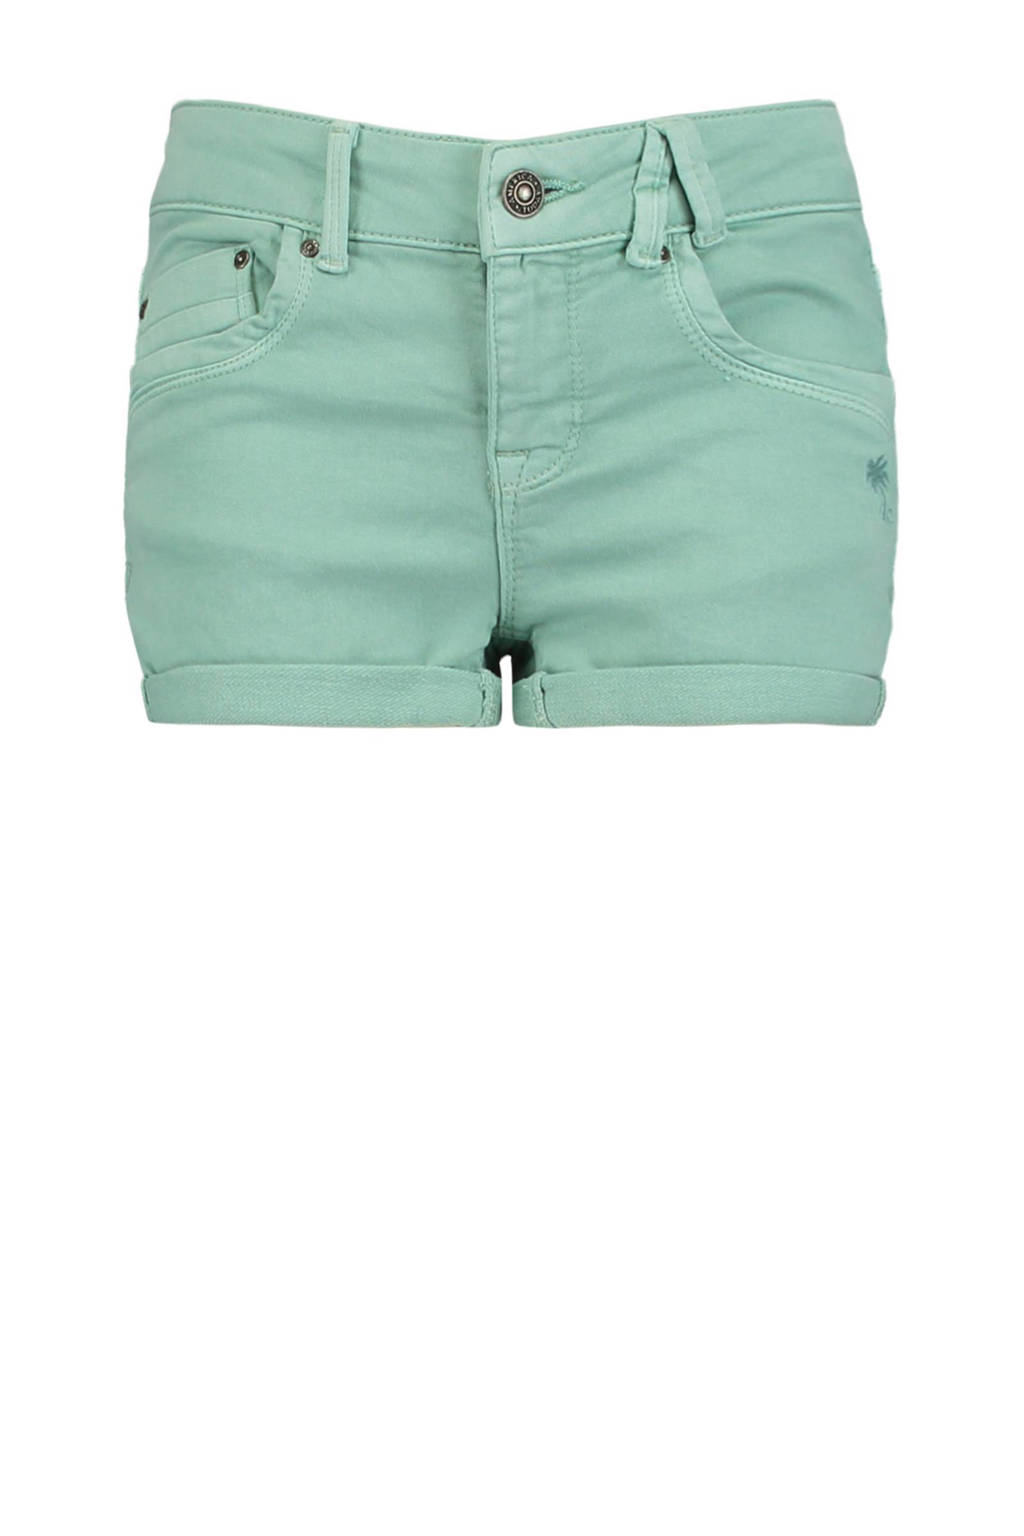 America Today Junior jeans short Noelle Jr. lichtgroen, Lichtgroen